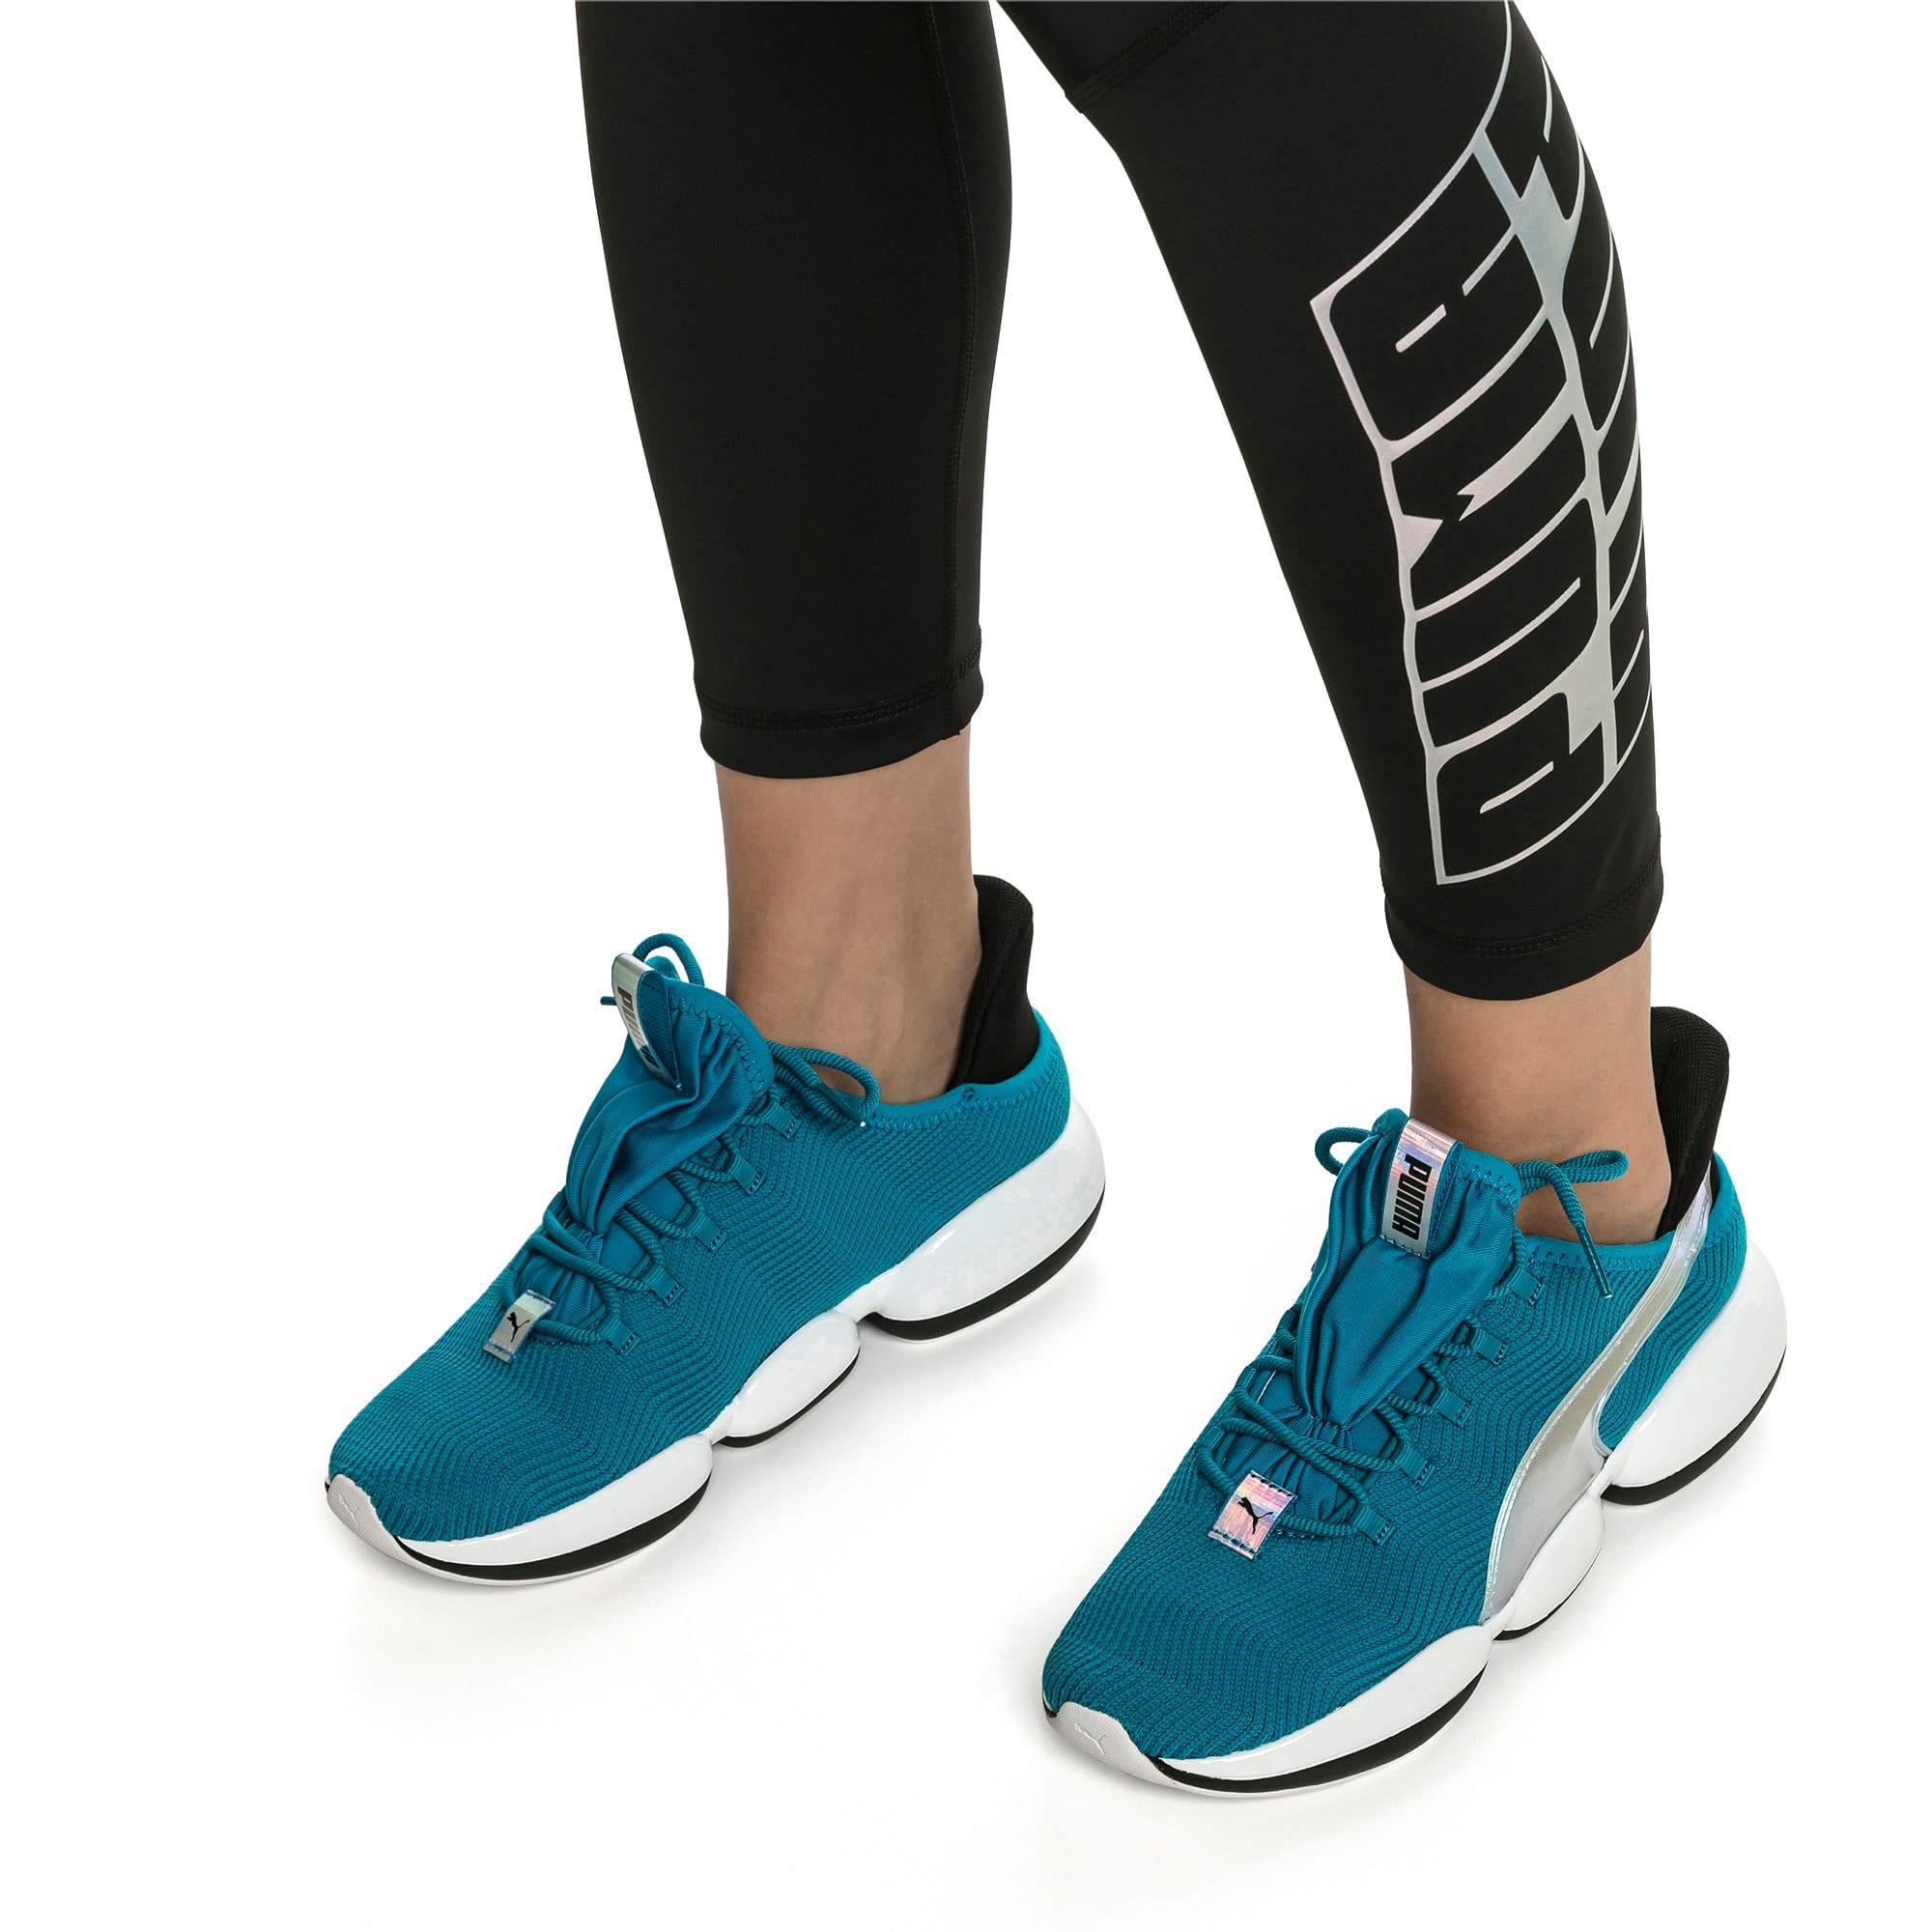 Thumbnail 2 of Mode XT Trailblazer Iridescent Women's Training Shoes, Caribbean Sea-Puma White, medium